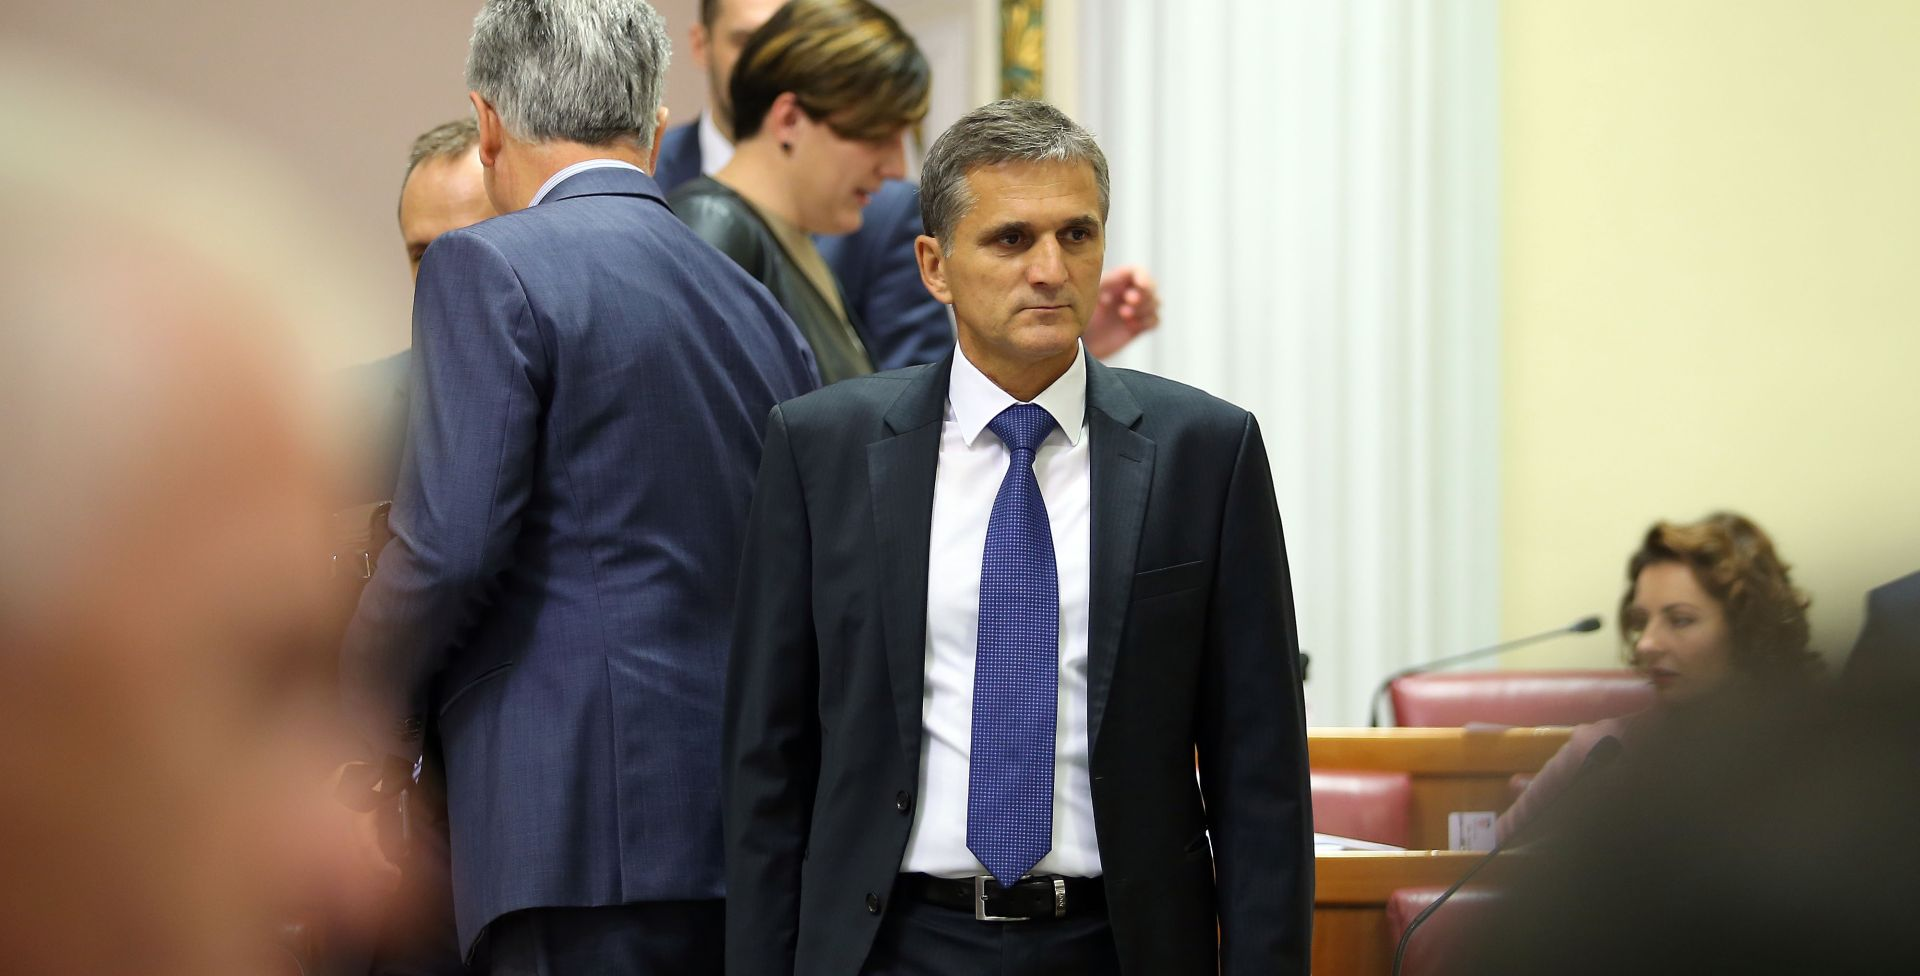 MINISTAR BEZ PORTFELJA Goran Marić podnio ostavku u Vladi?